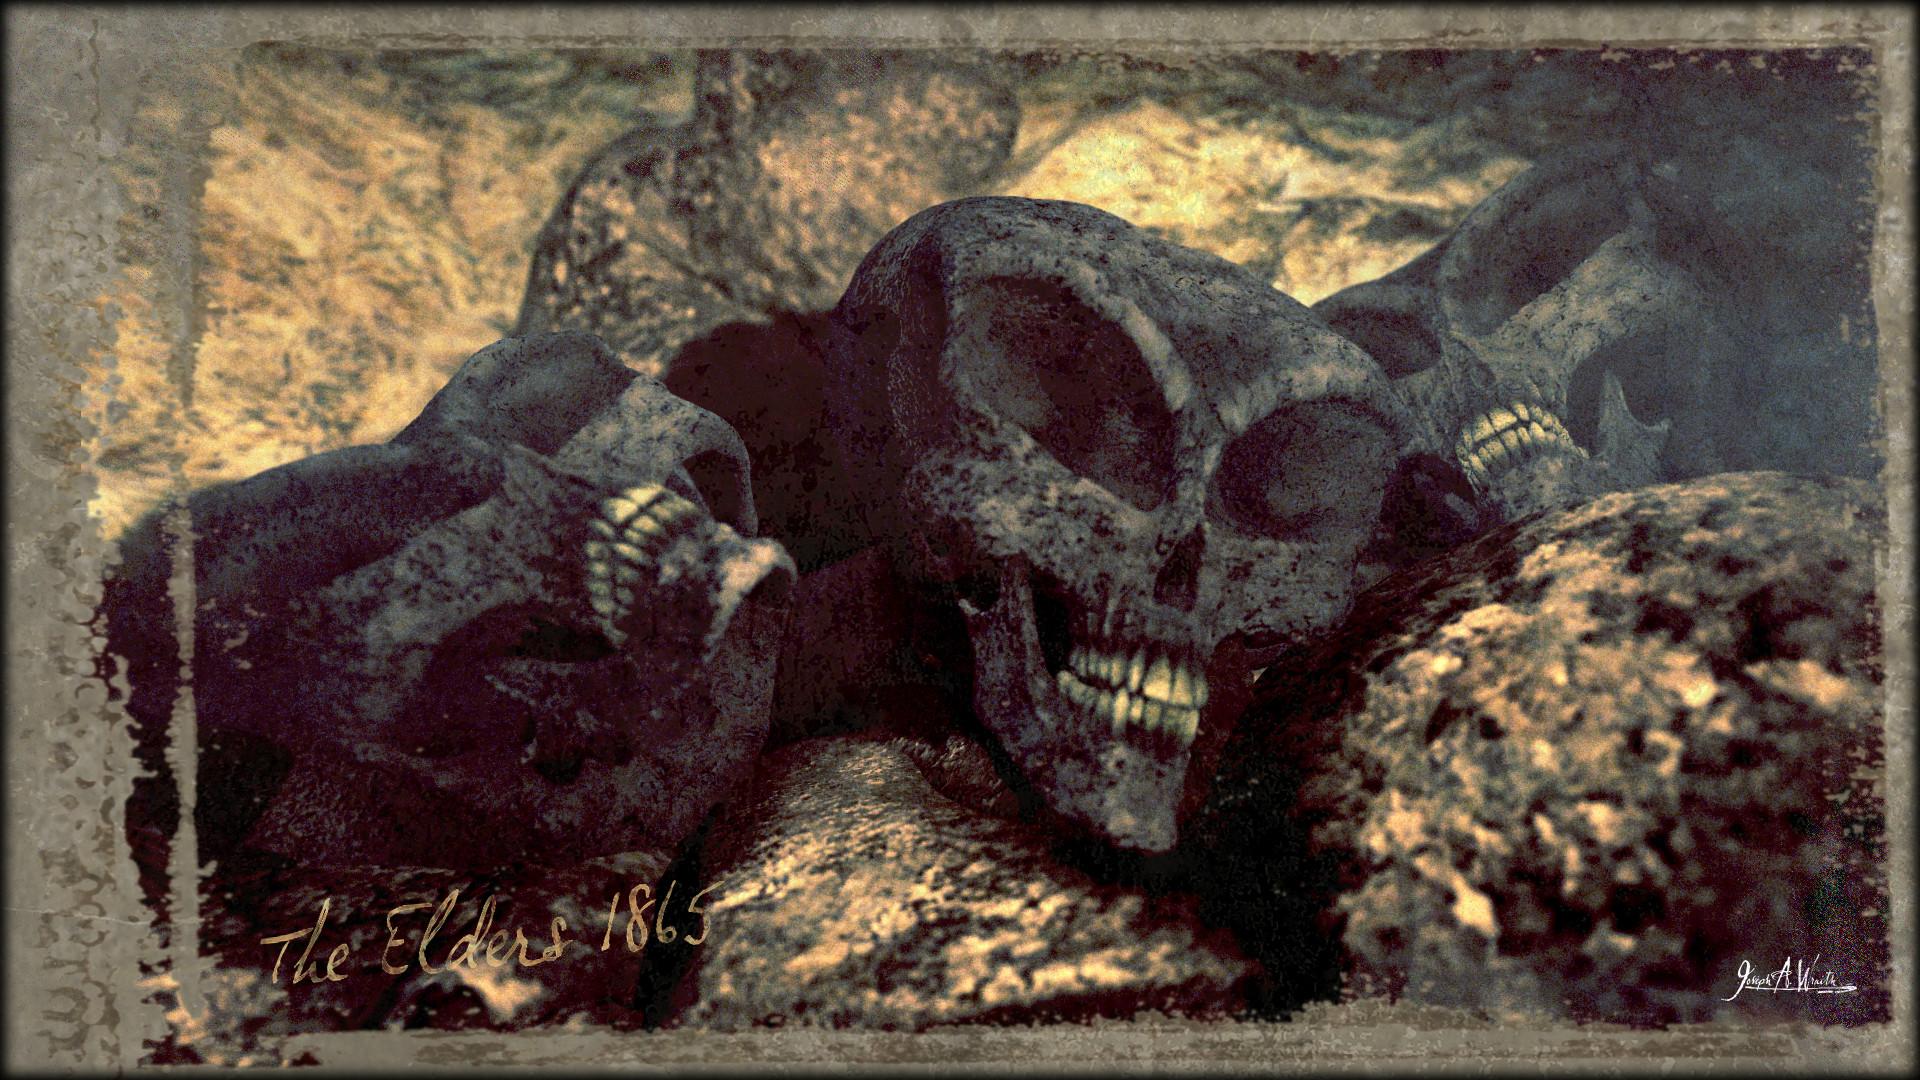 Joseph wraith the elders fin